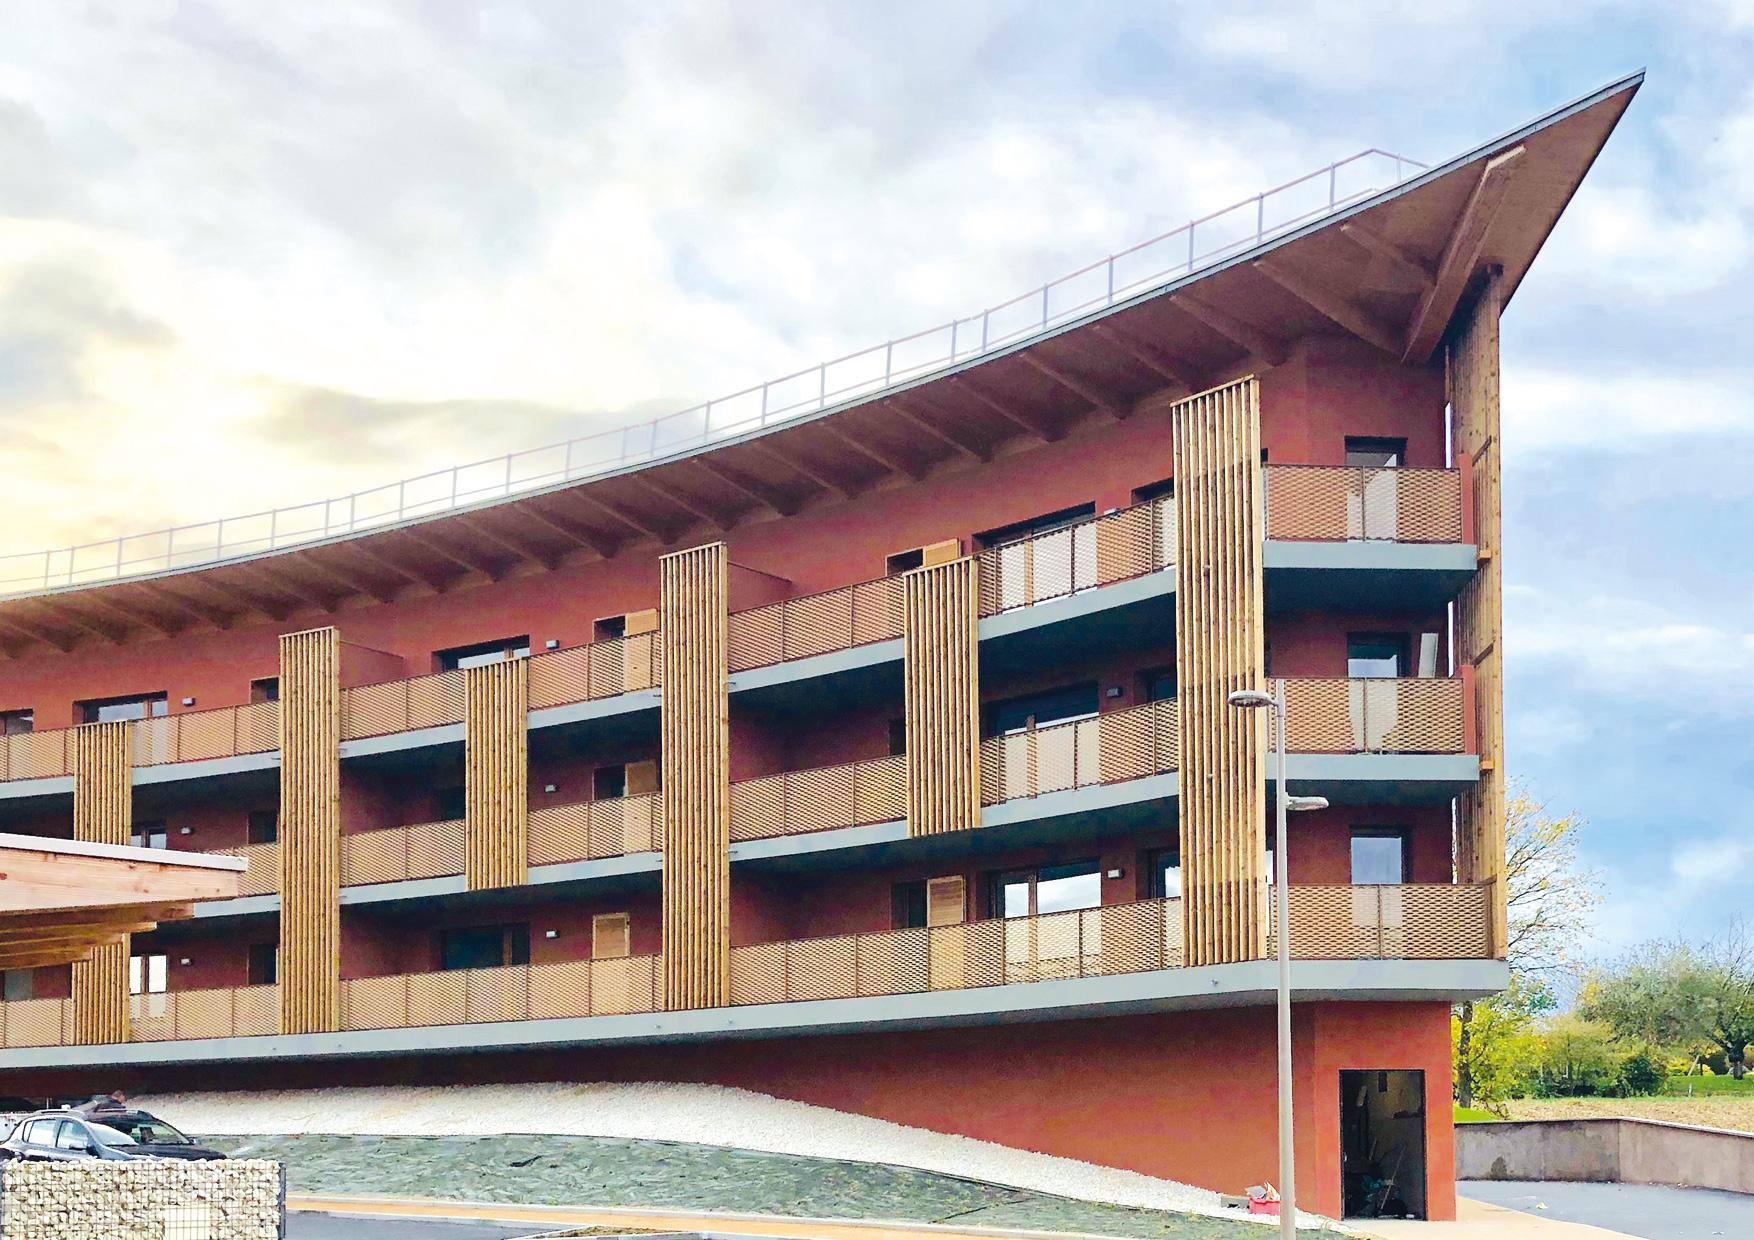 Montrevel en Bresse - Jayat - Immeuble collectif